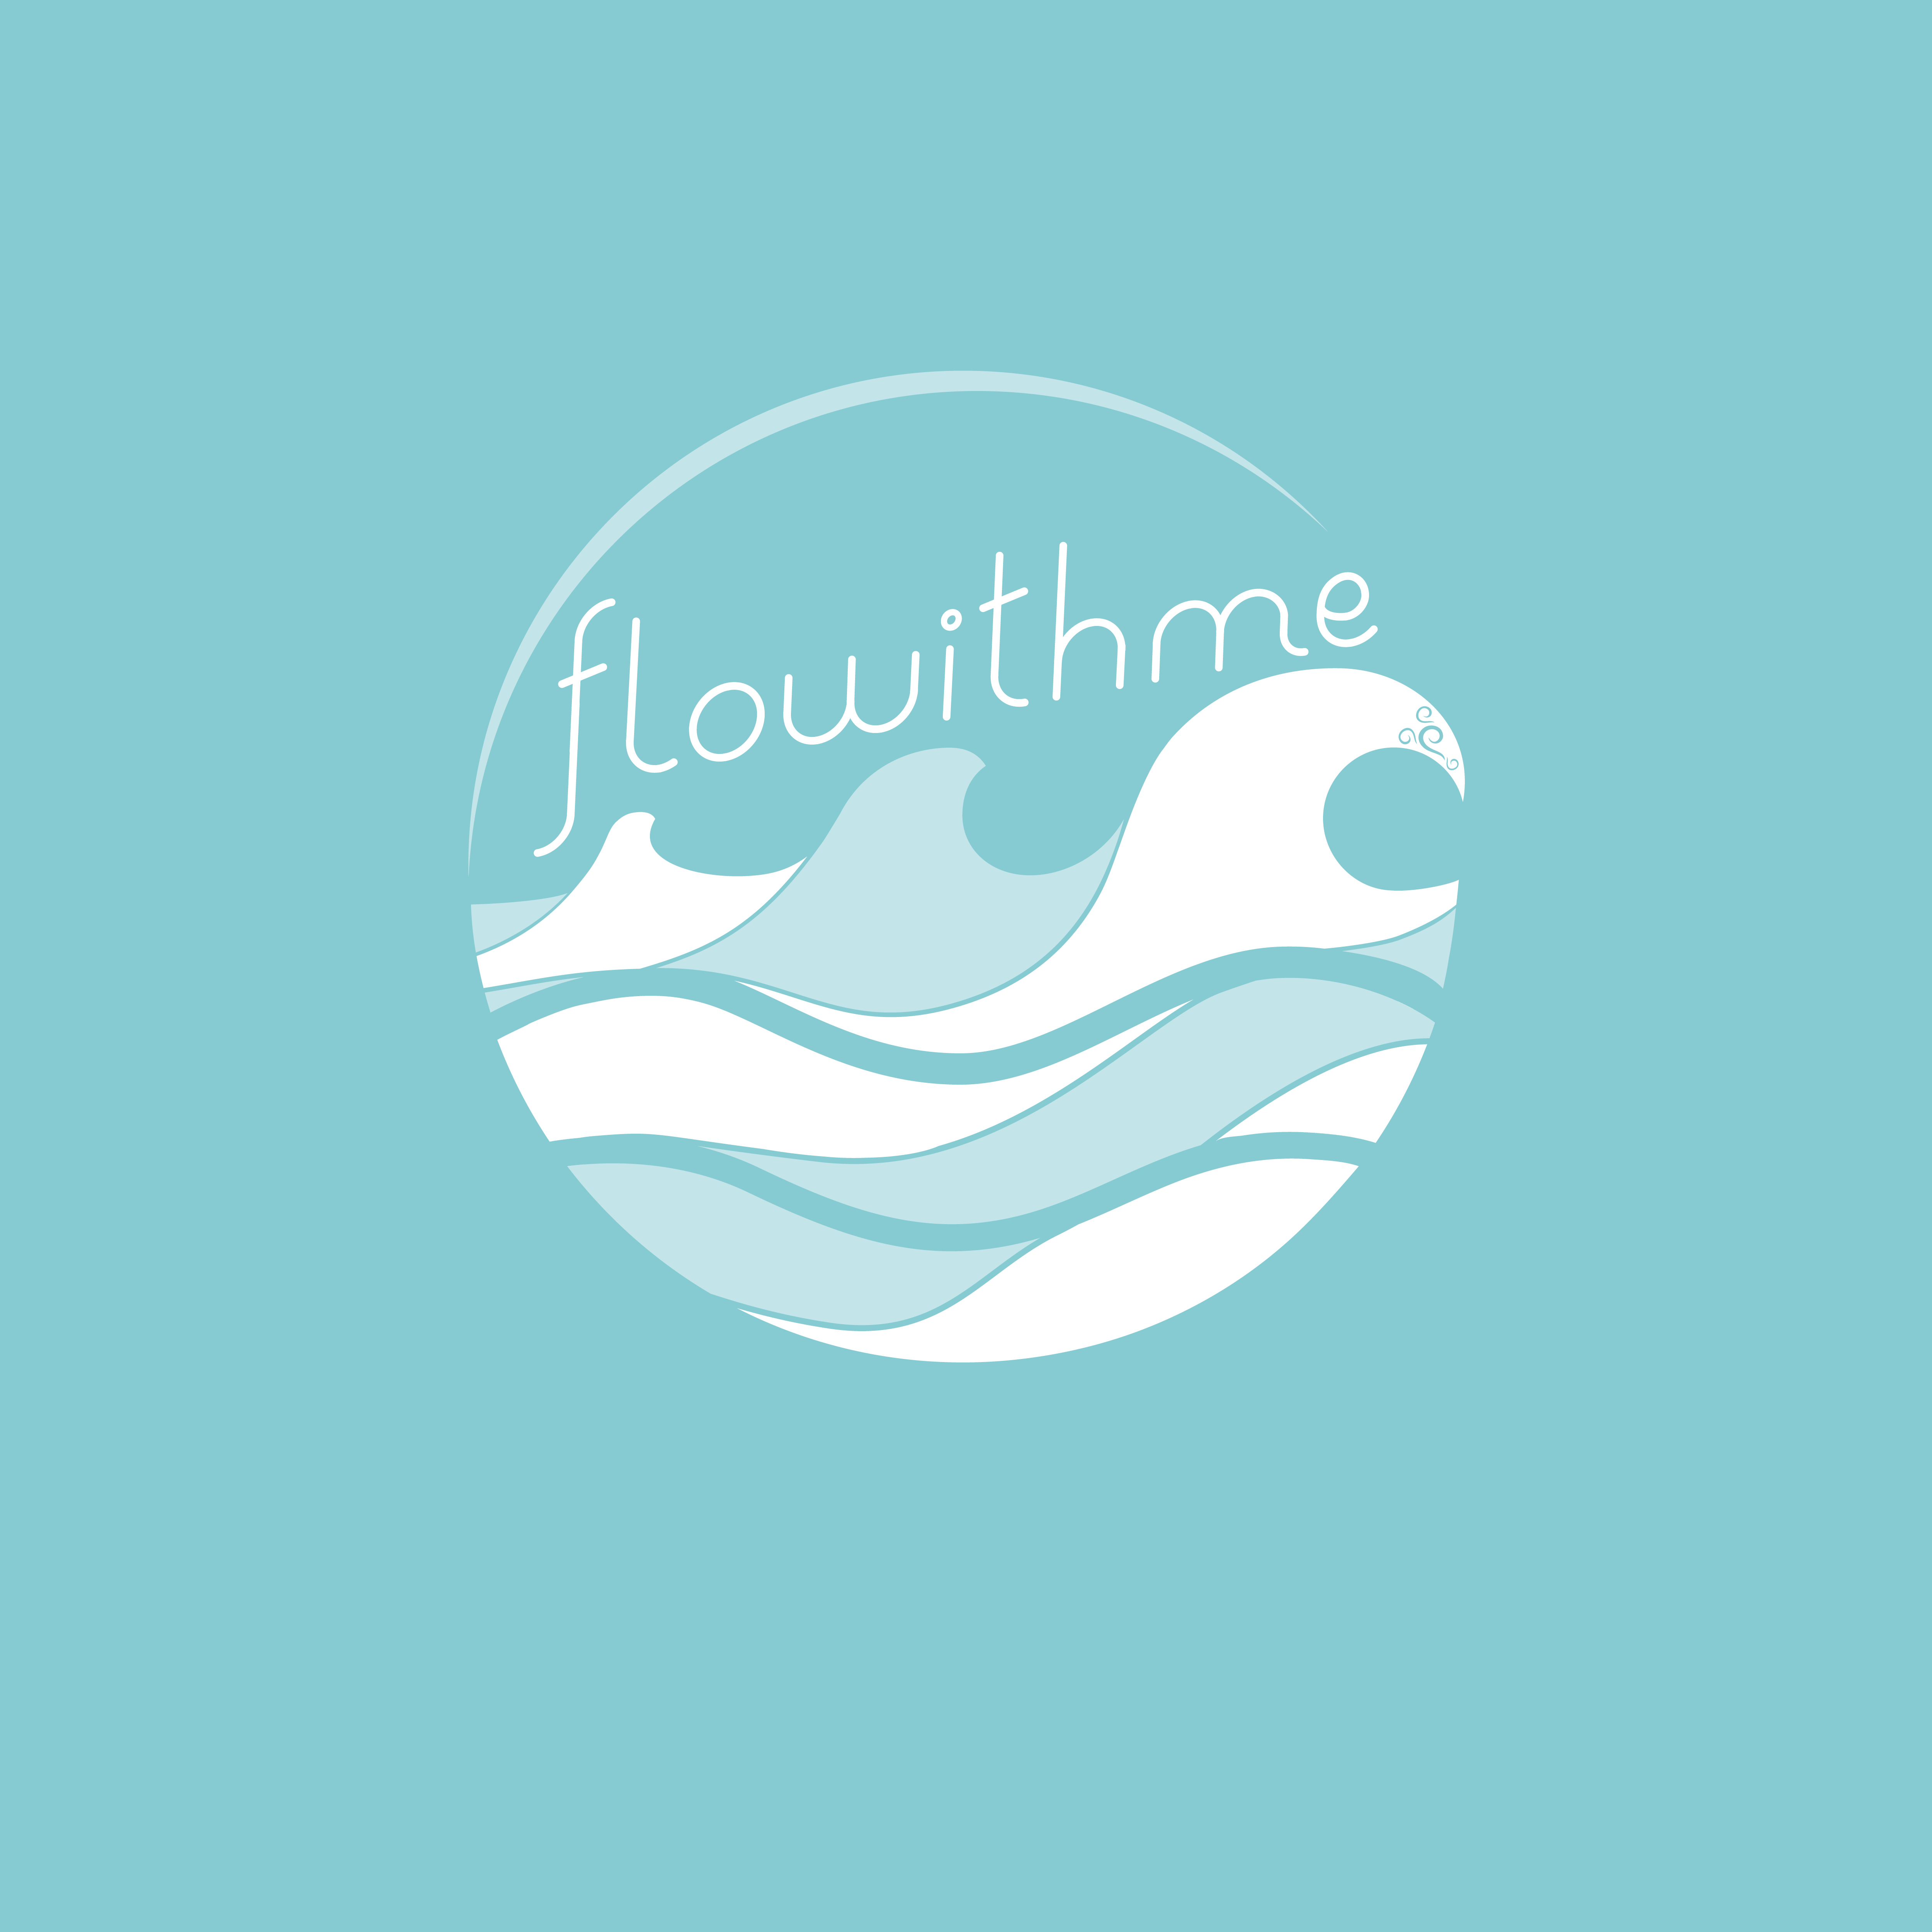 new-logo-2020